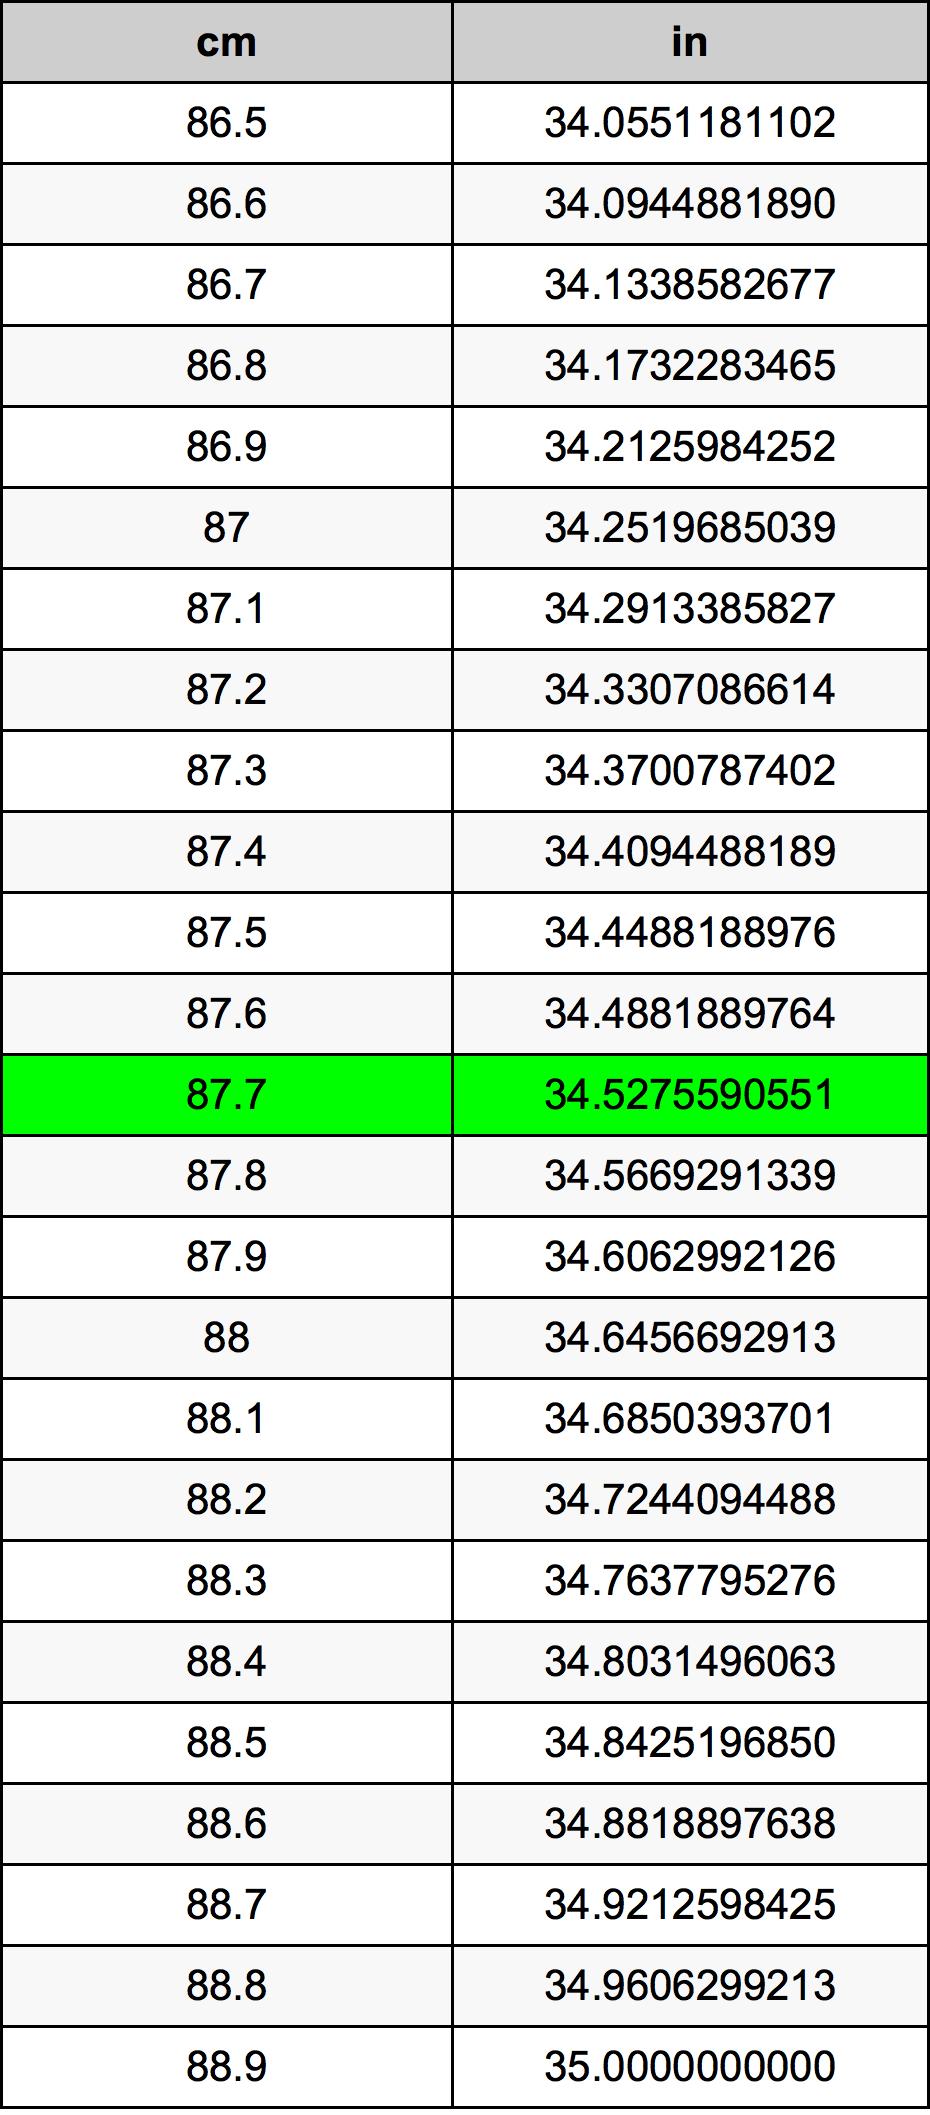 87.7 Centímetro Tabla de conversión